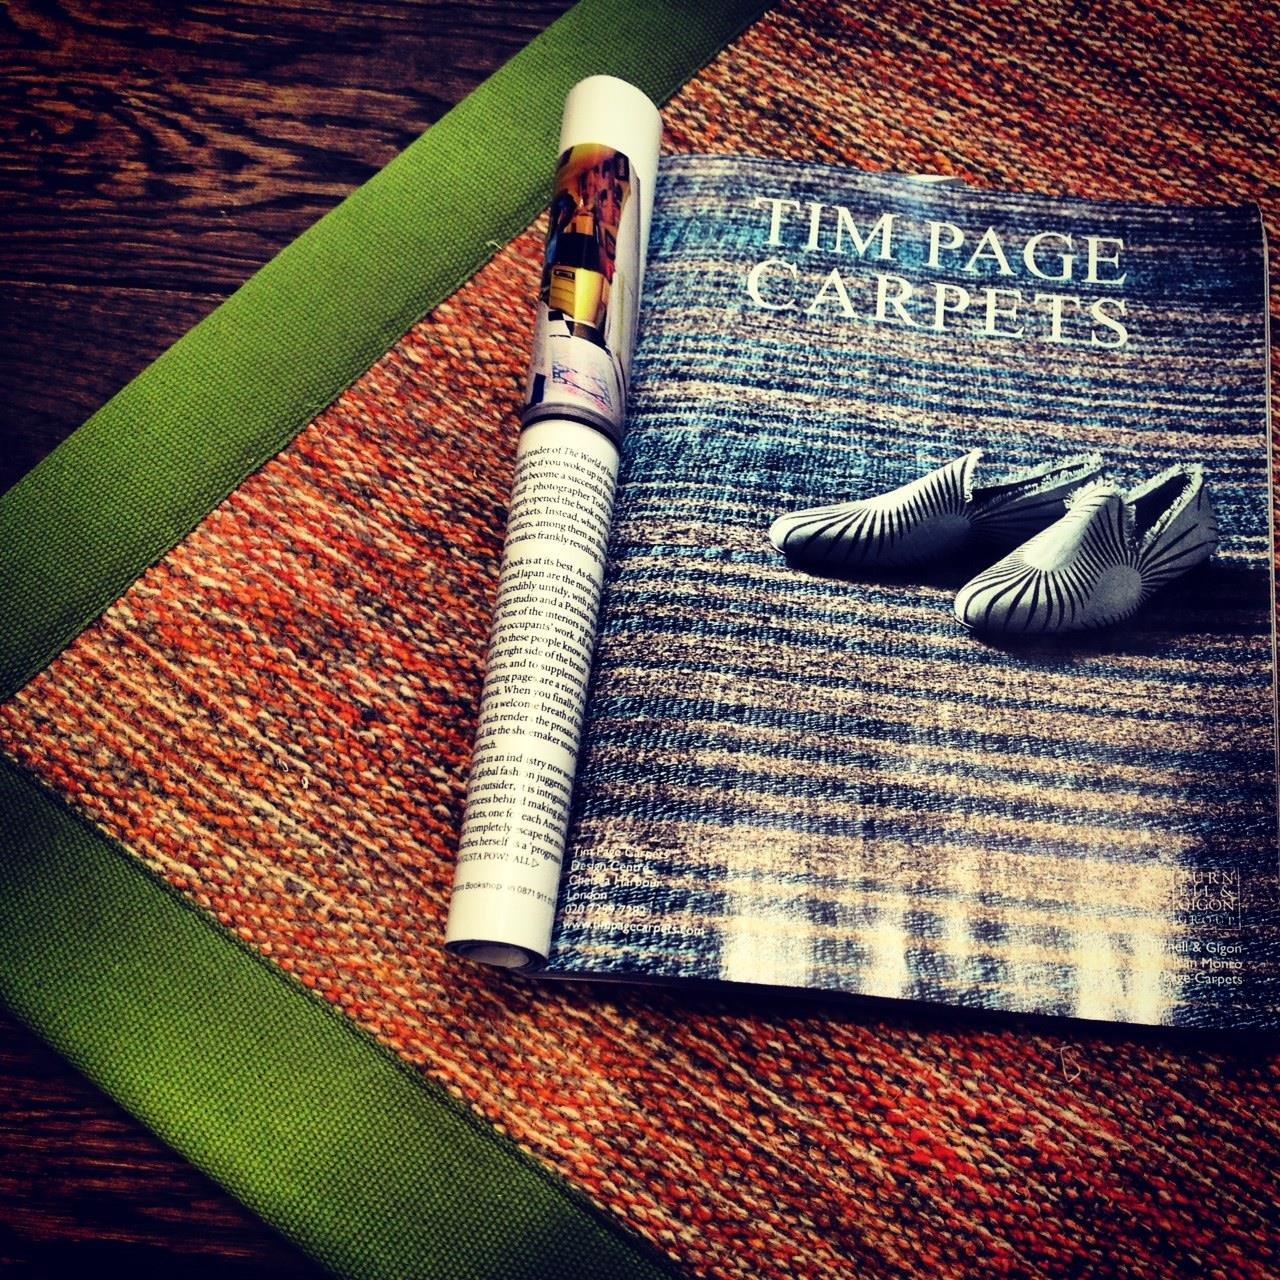 Tim Page Carpets Timpagecarpets Twitter